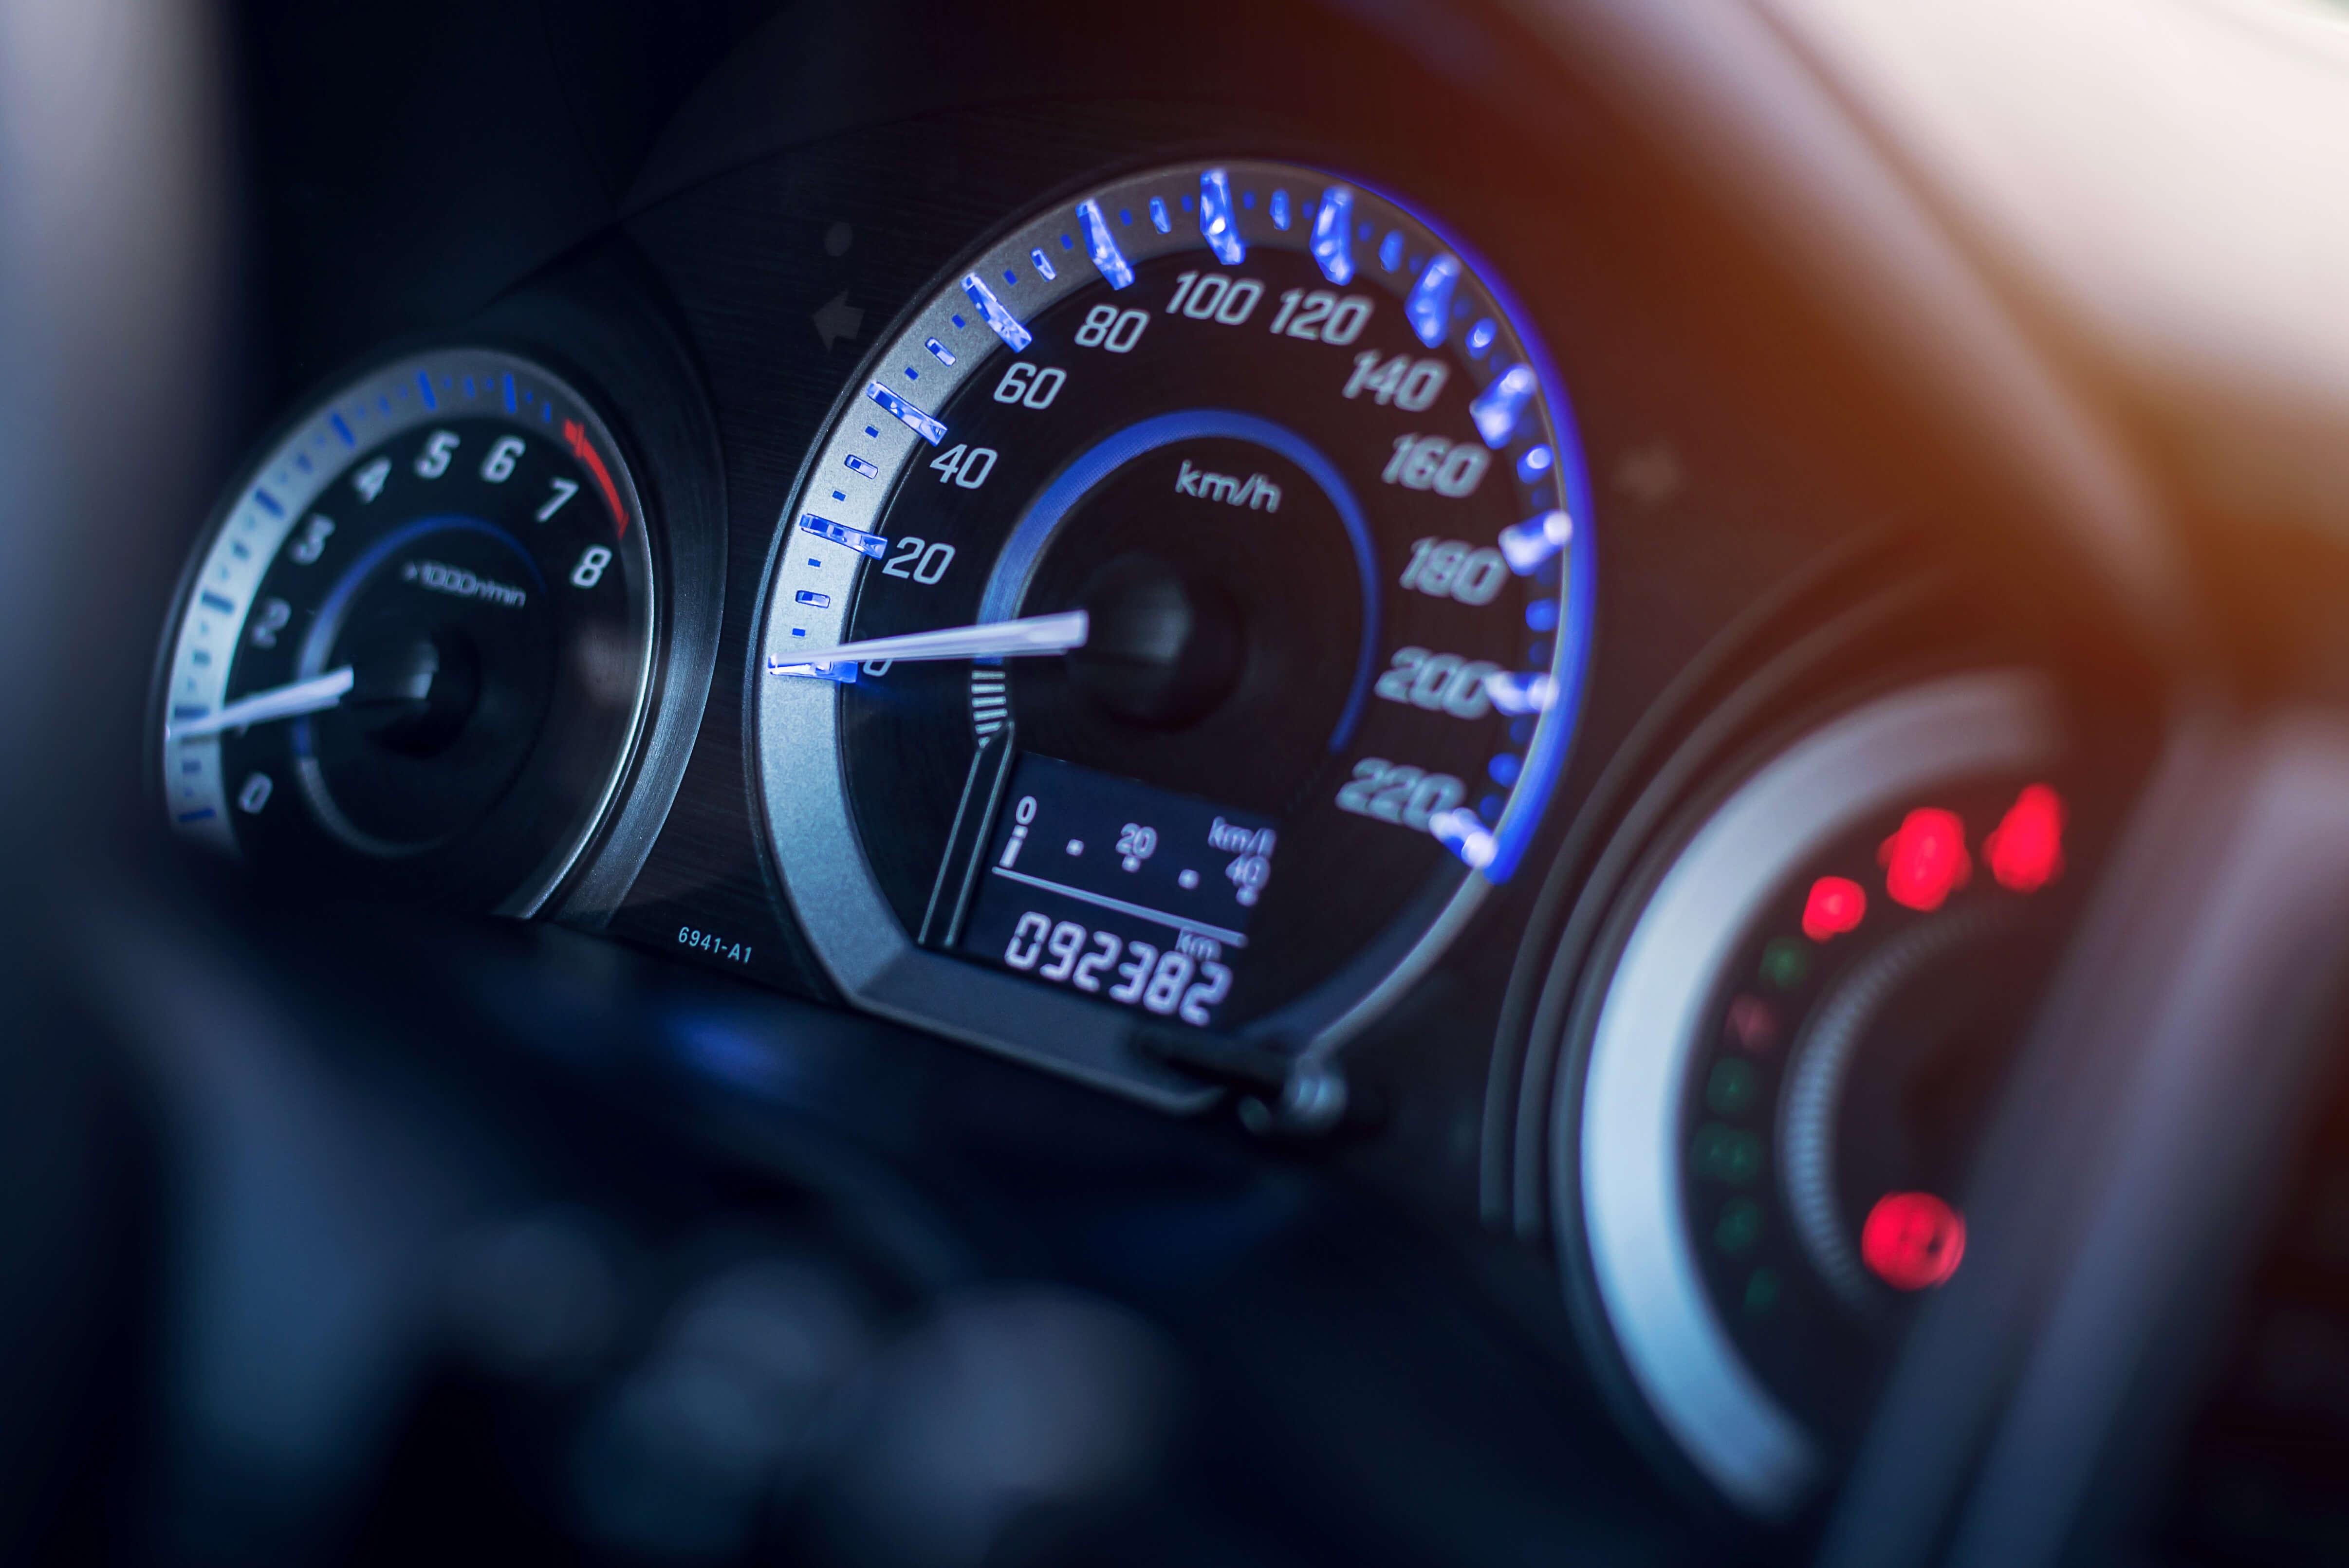 Recording motor vehicle odometer for FBT